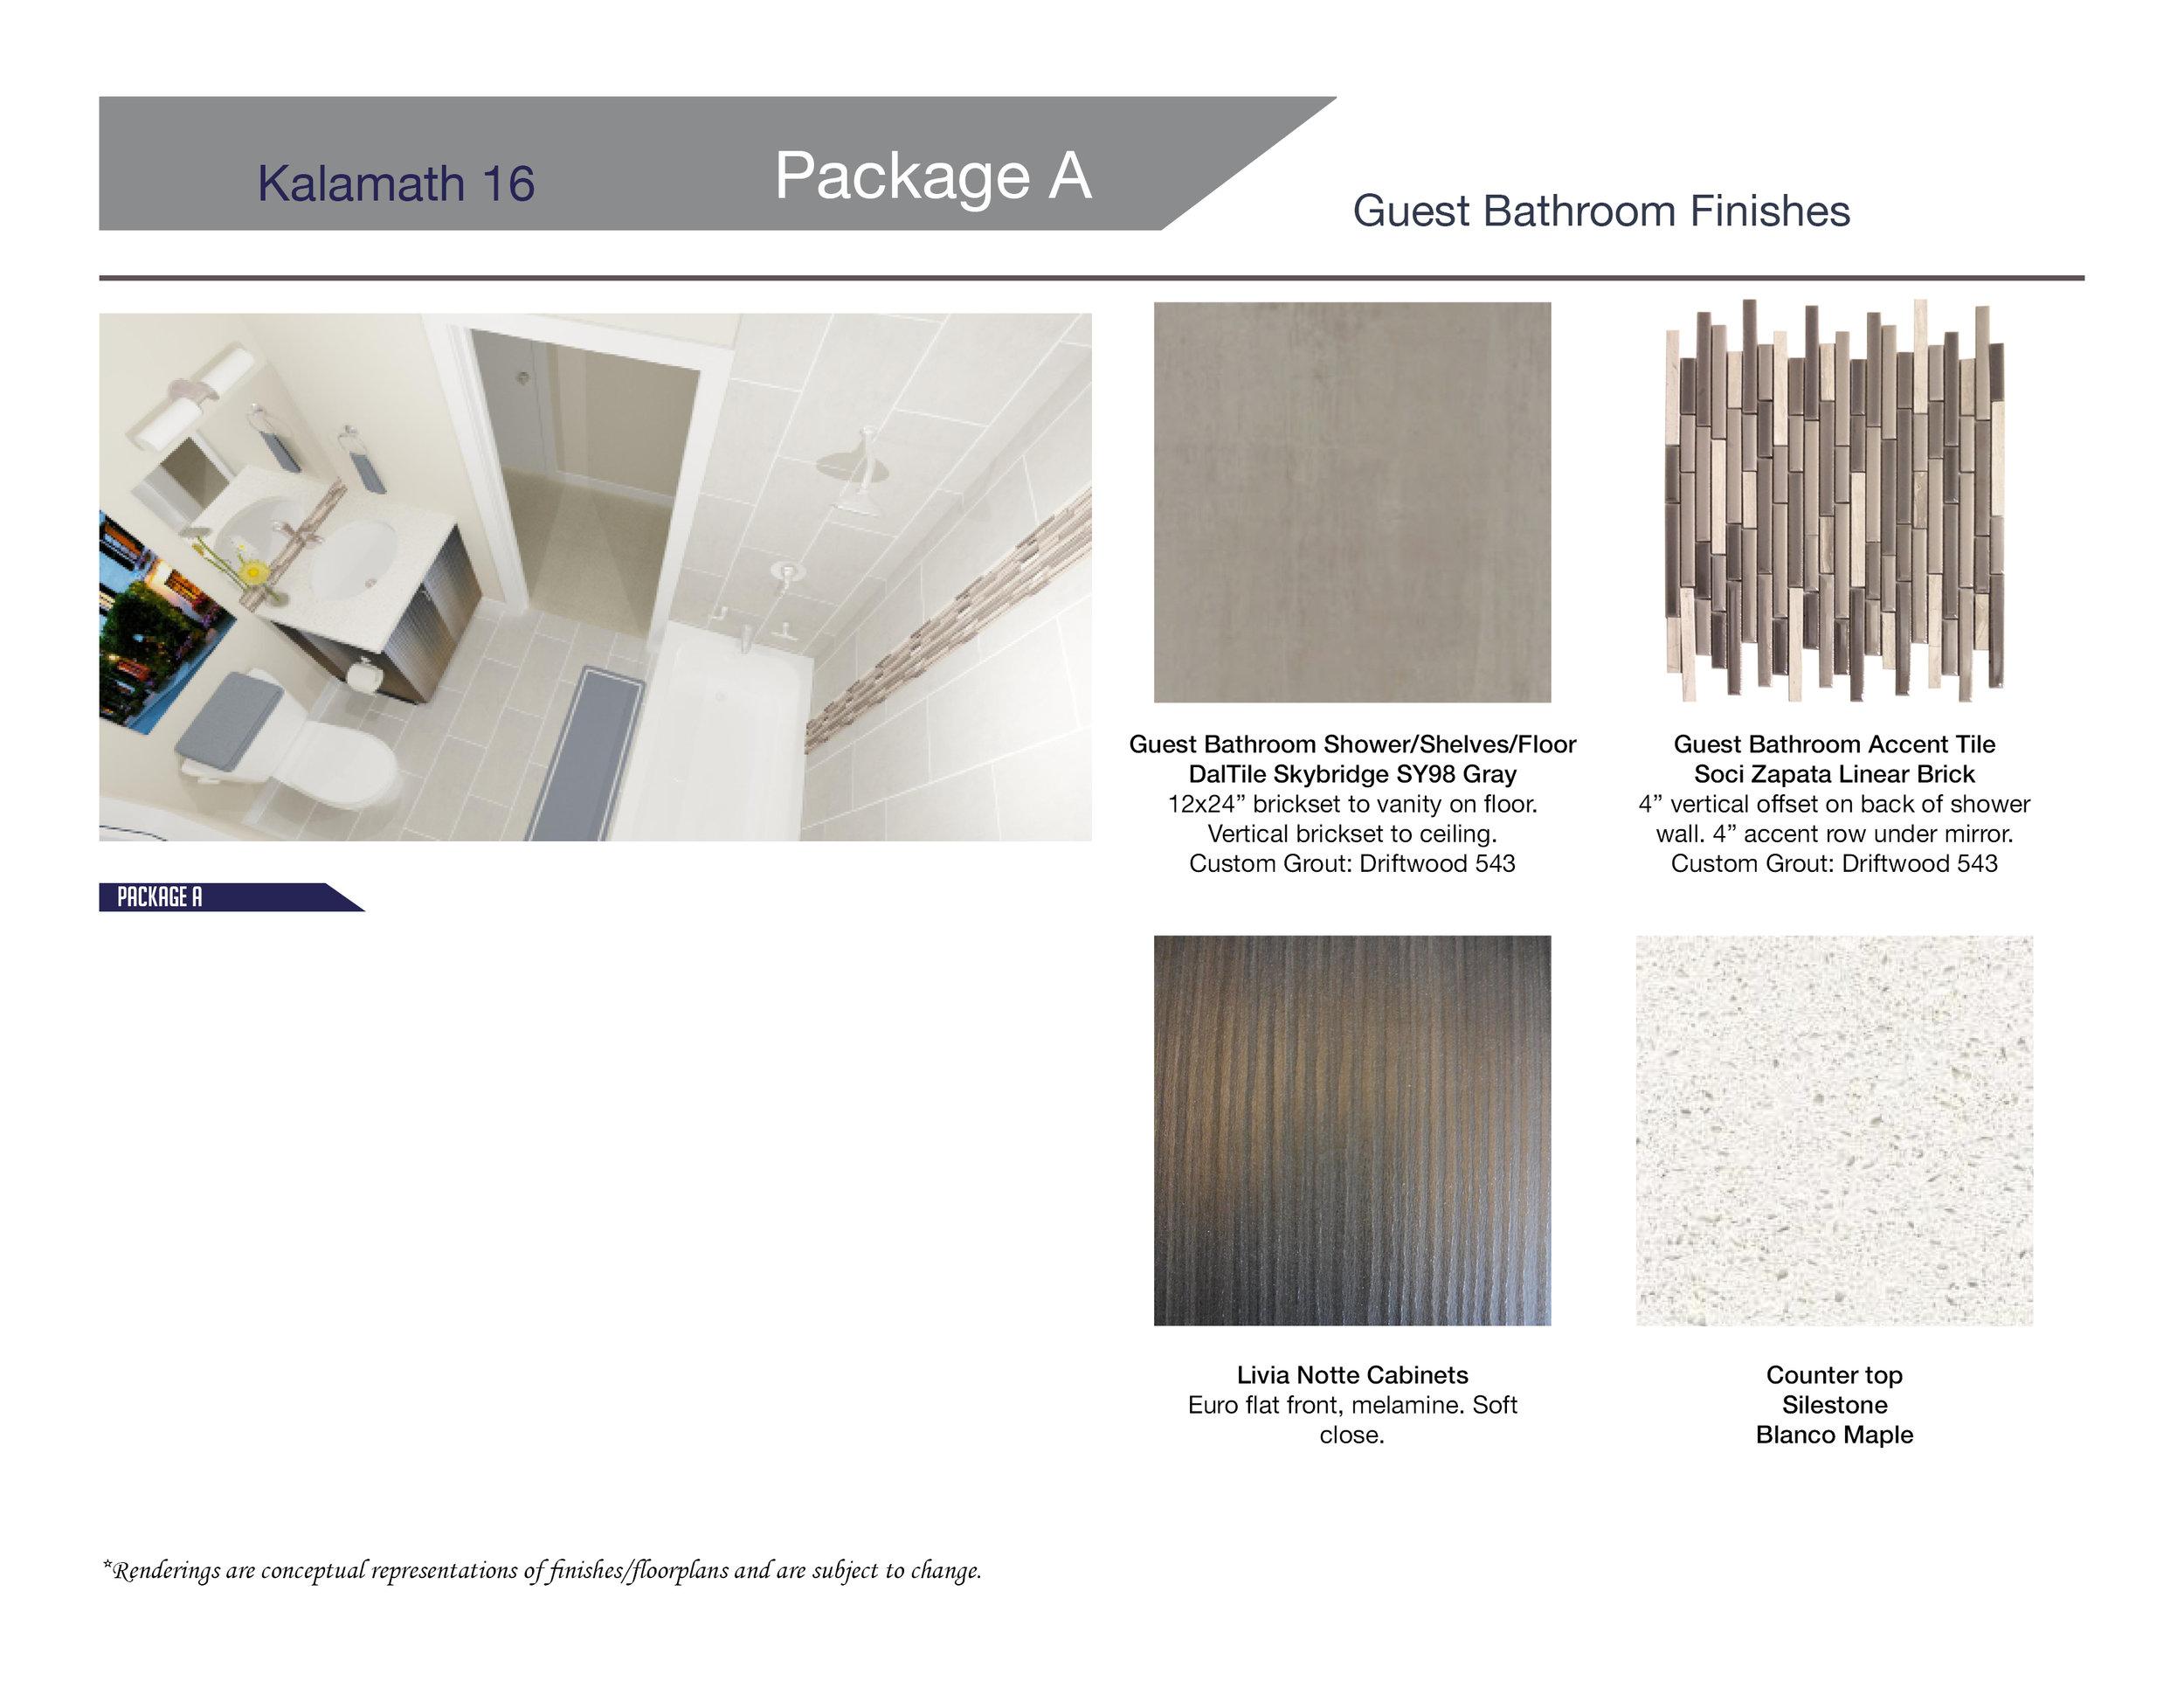 Kalamath Package A new7.jpg